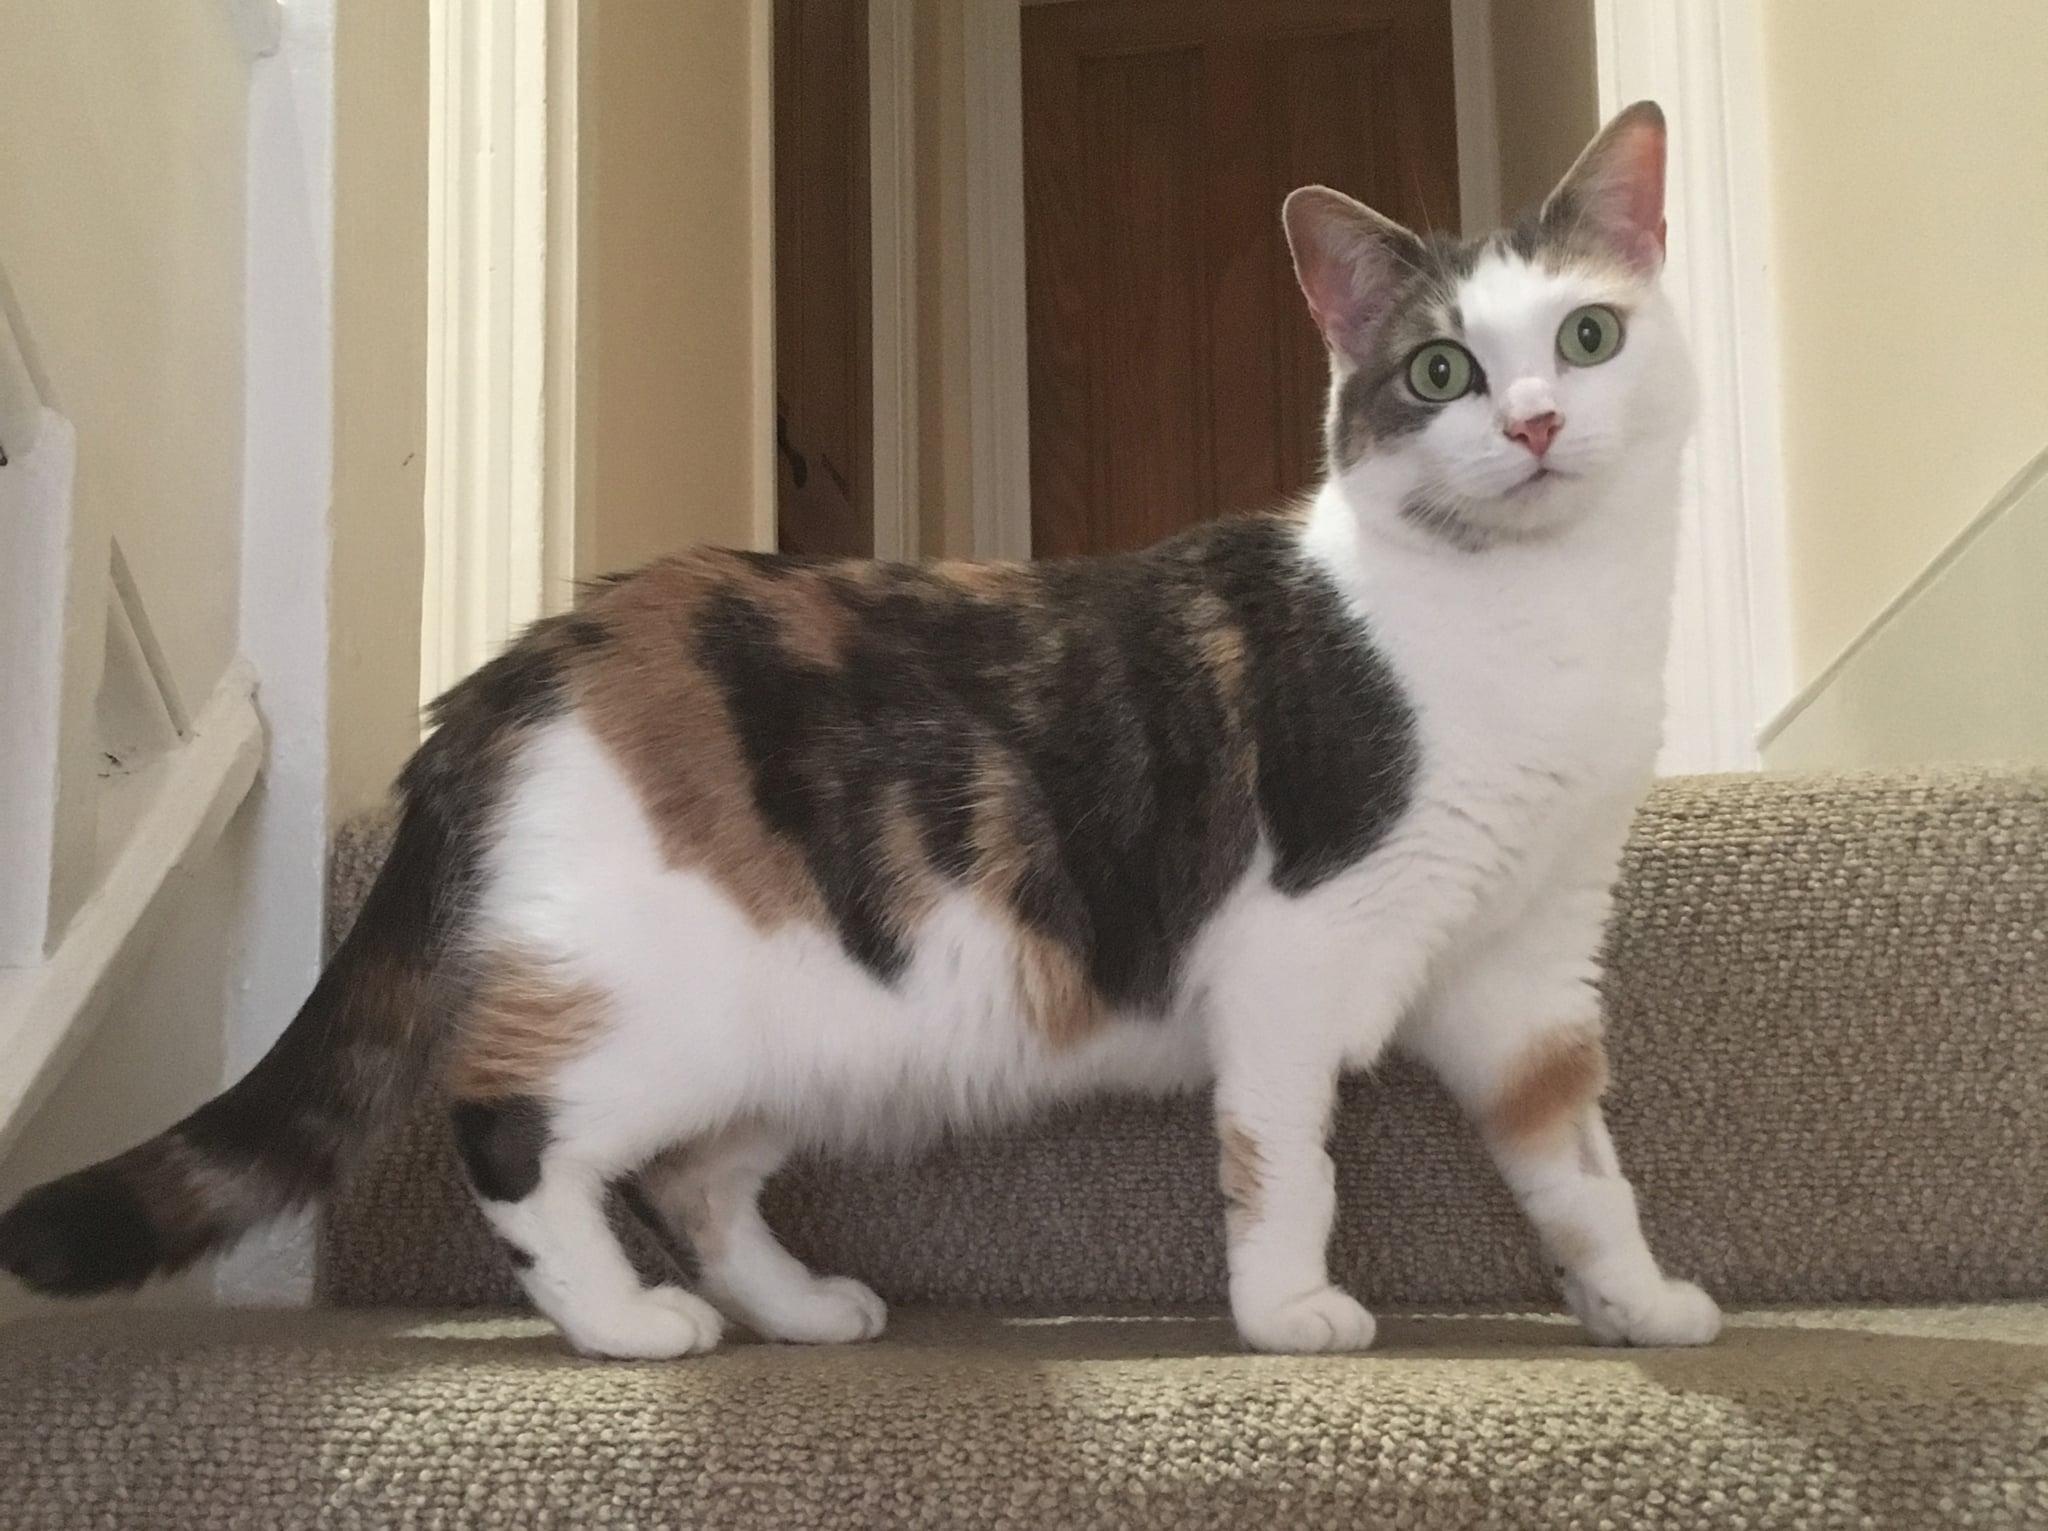 kitty cat meow